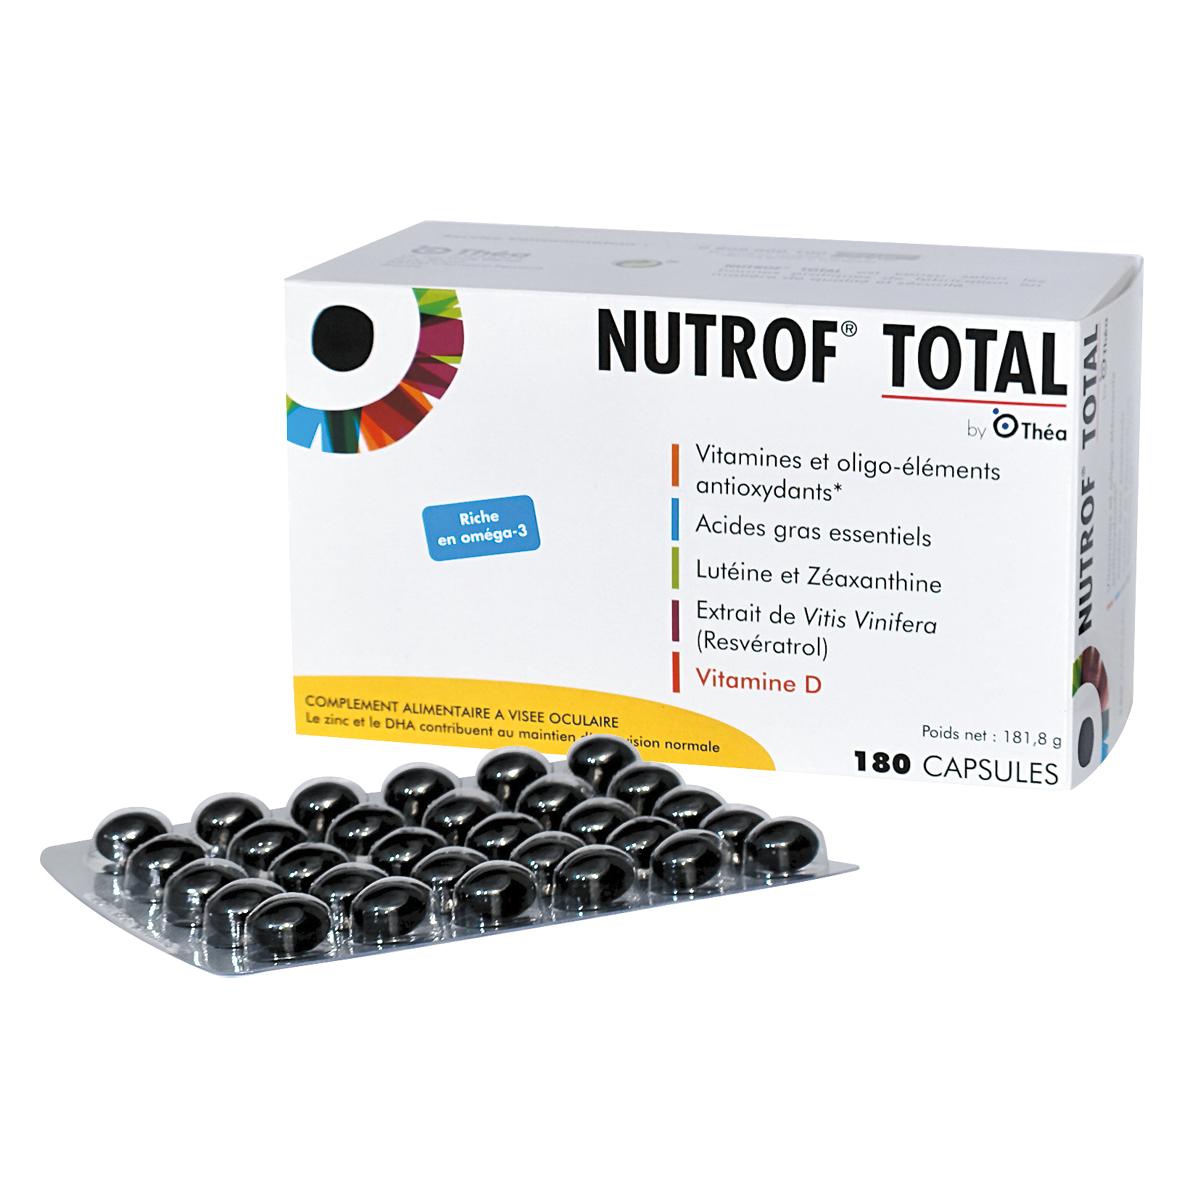 NUTROF TOTAL® 180 CAPSULES Image